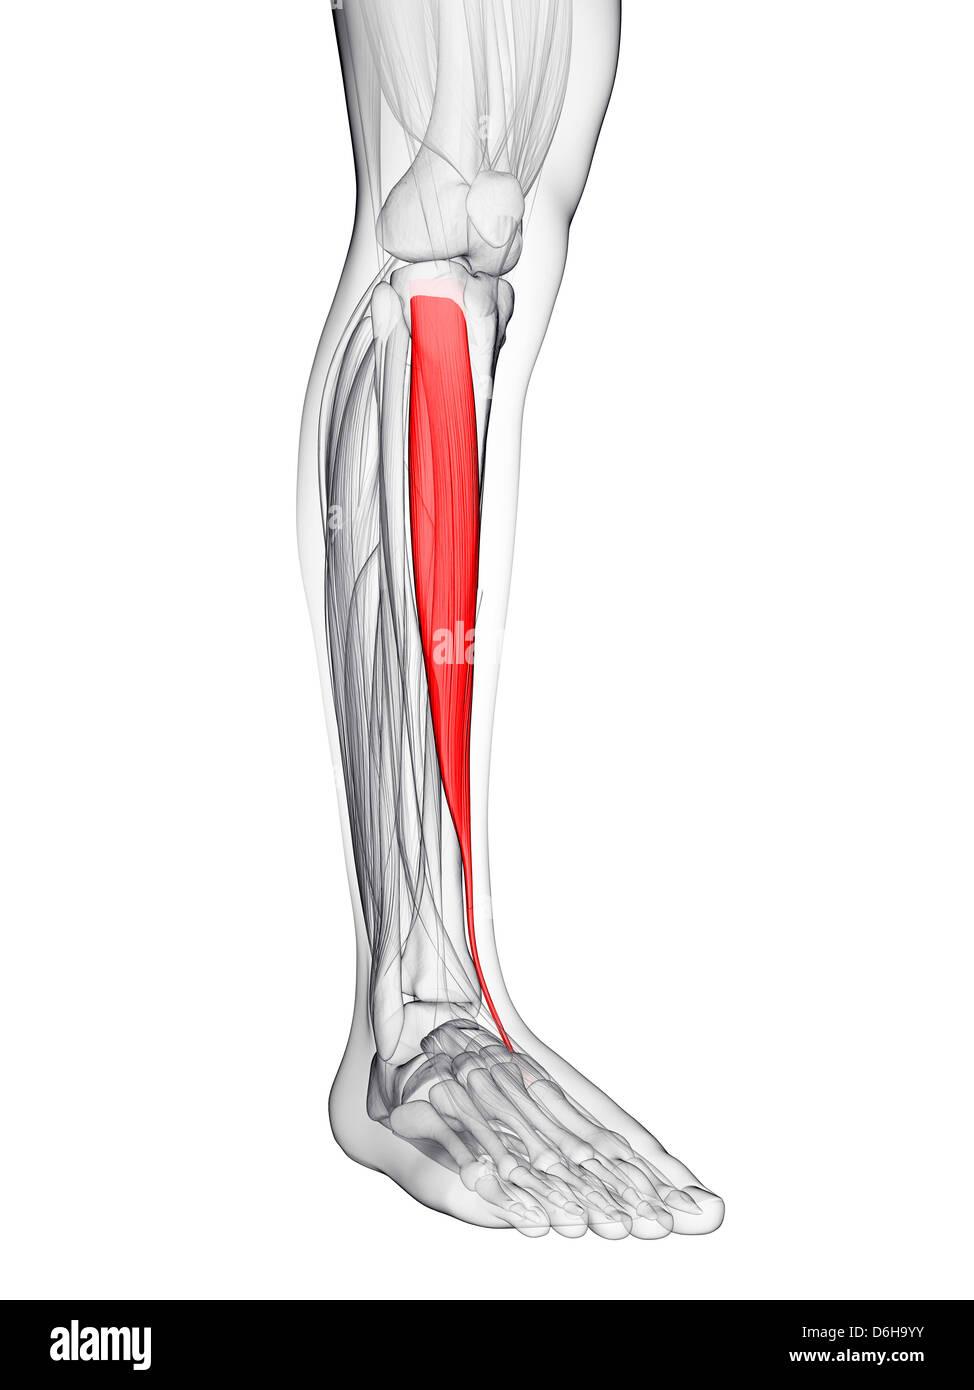 Tibialis Anterior Muscle Stock Photos & Tibialis Anterior Muscle ...